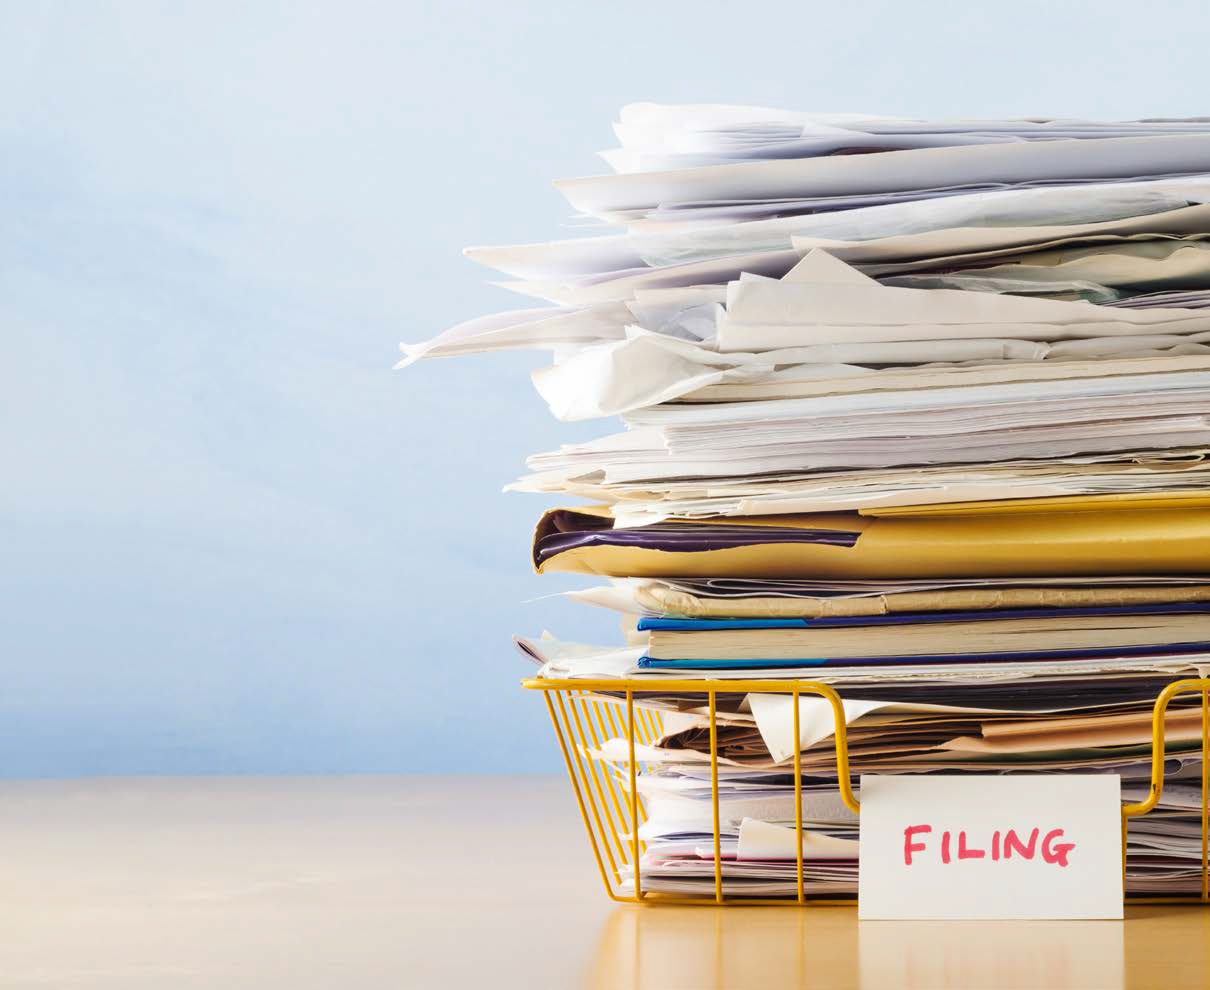 Paper Folders Filers Office Desk - Stock Image